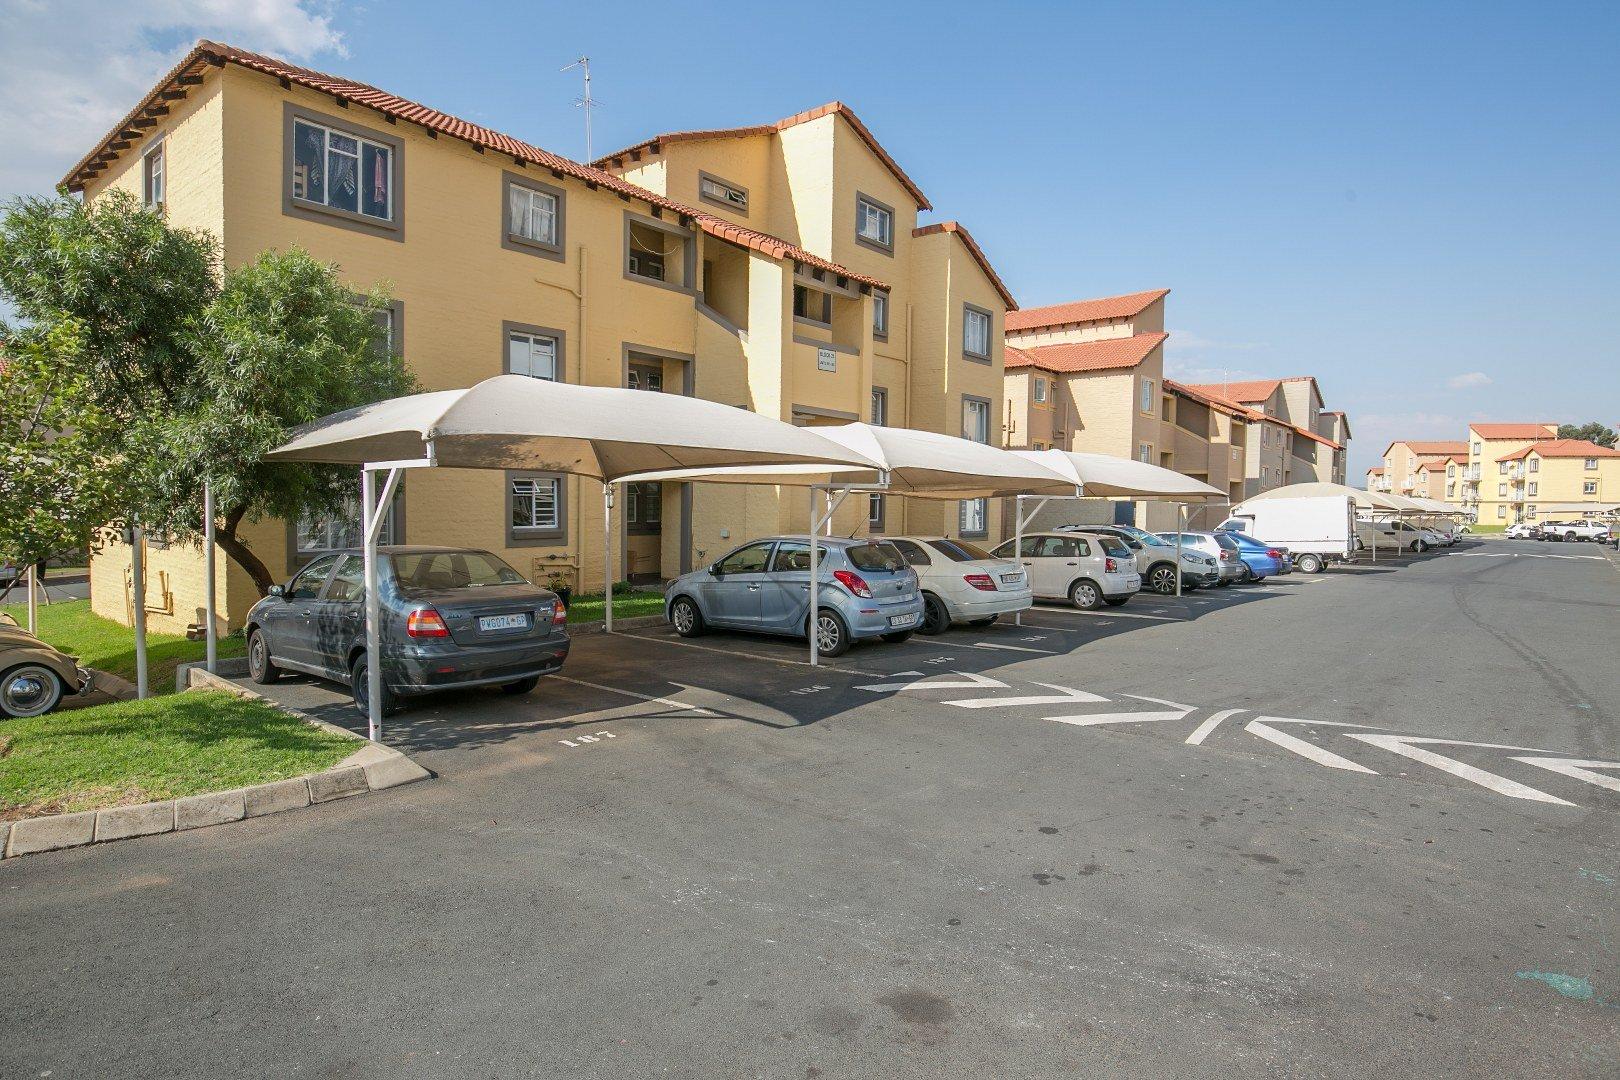 Property for Sale by Nicole   Zahiya Ferreira, Townhouse, 2 Bedrooms - ZAR 575,000